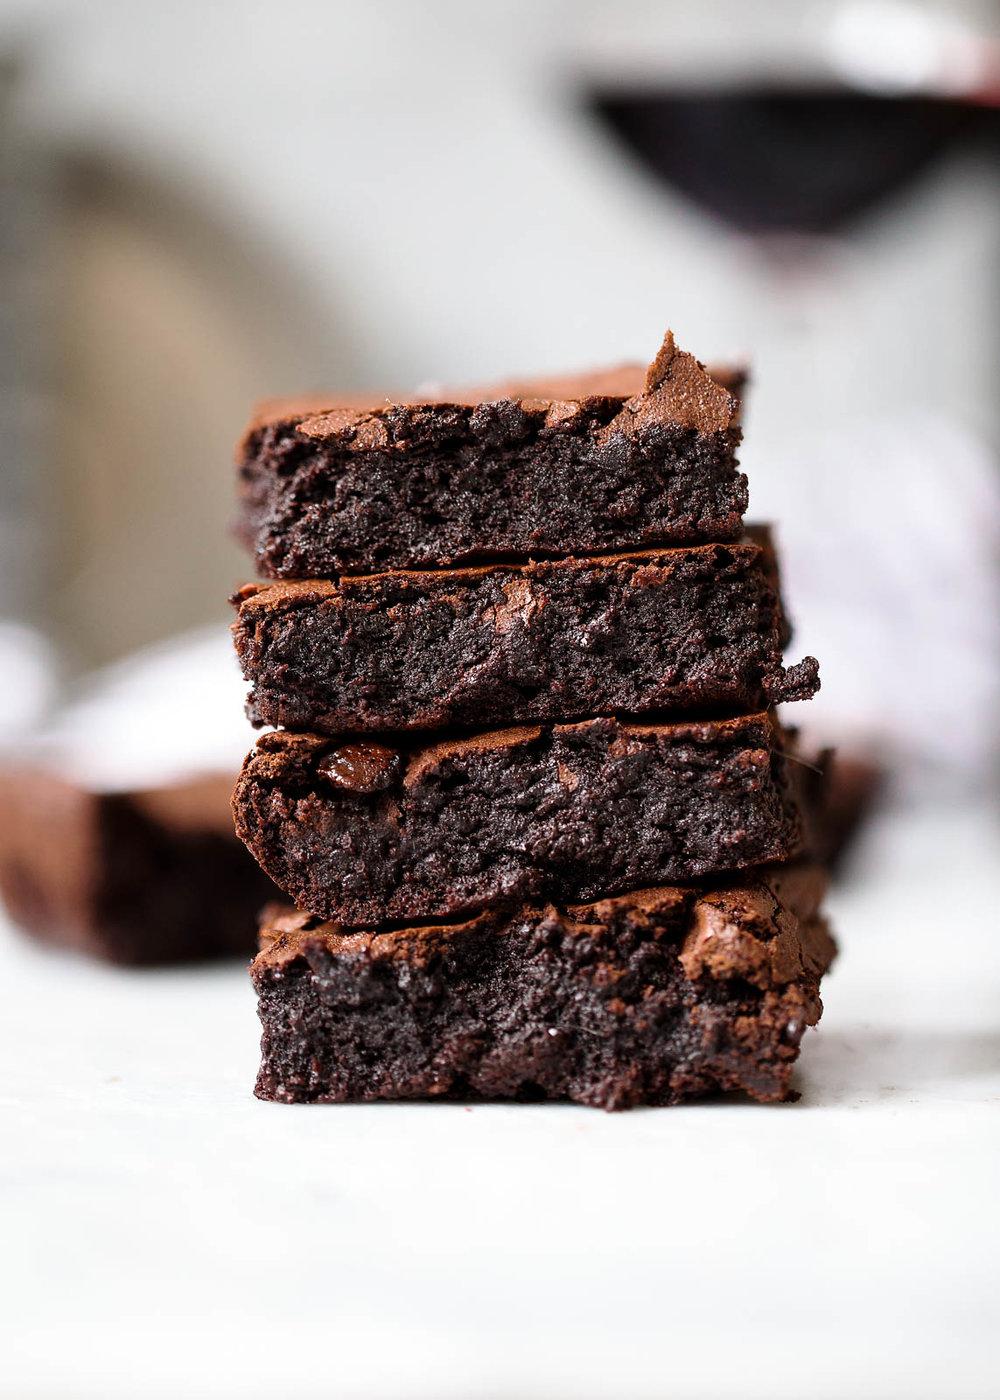 Brownies (Baked Goods)